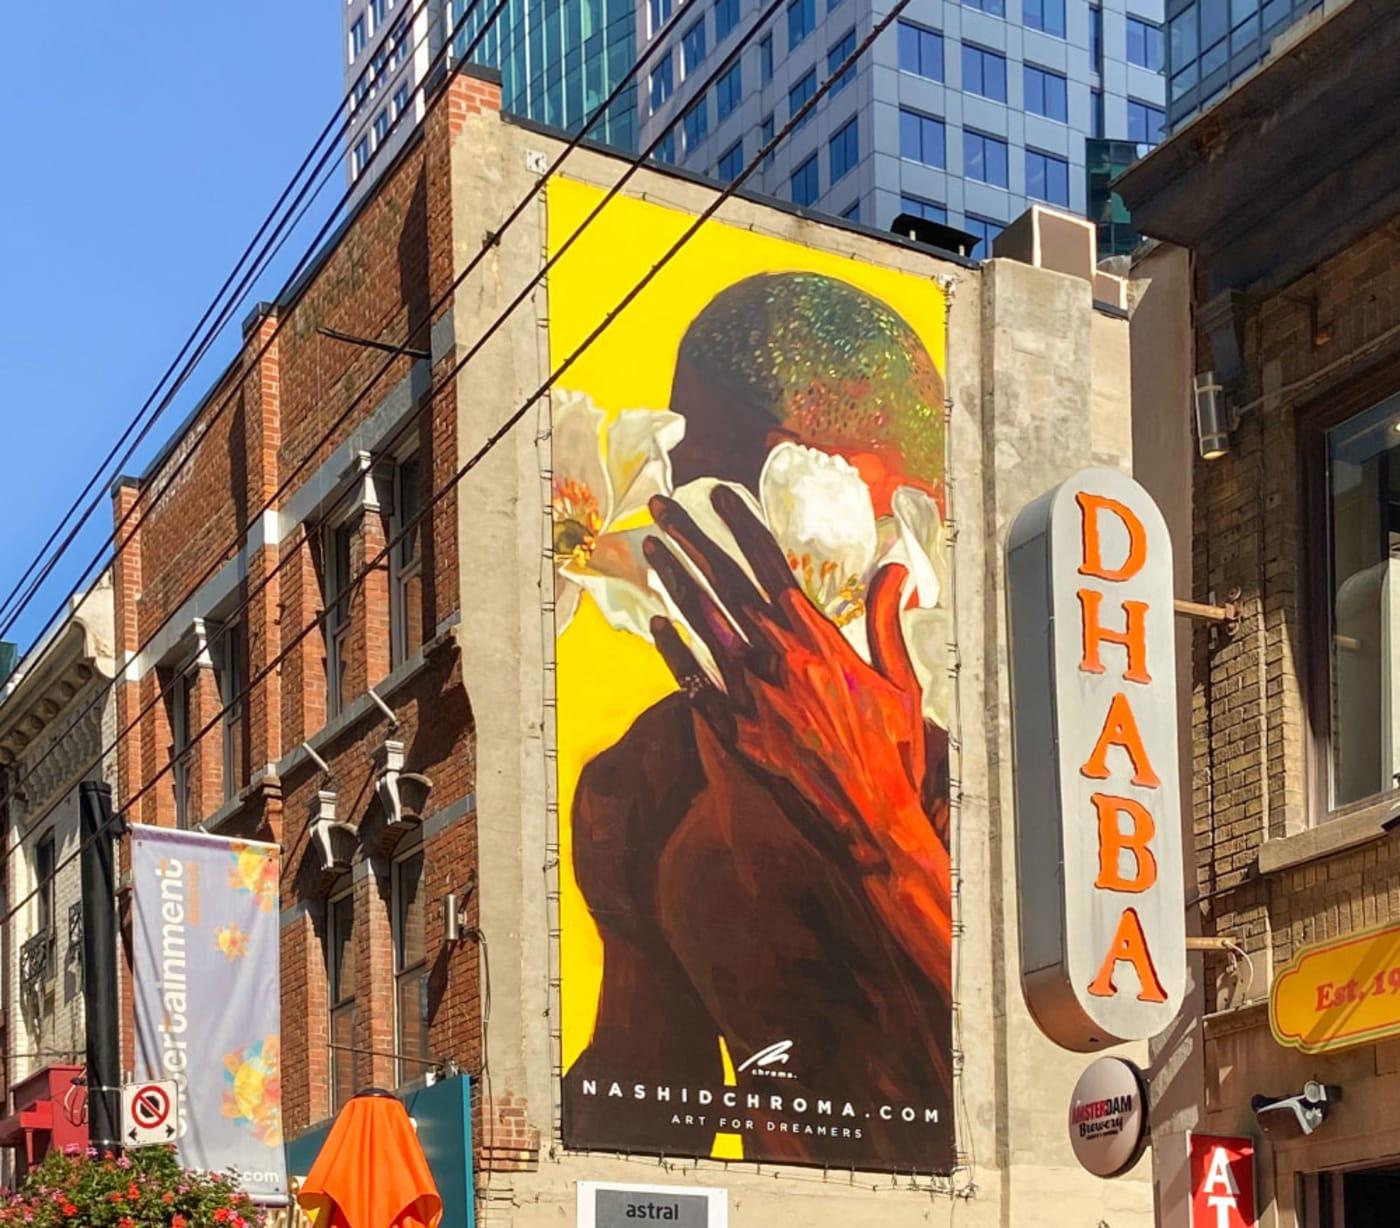 Nashid Chroma's Frank Ocean artwork on the side of a building